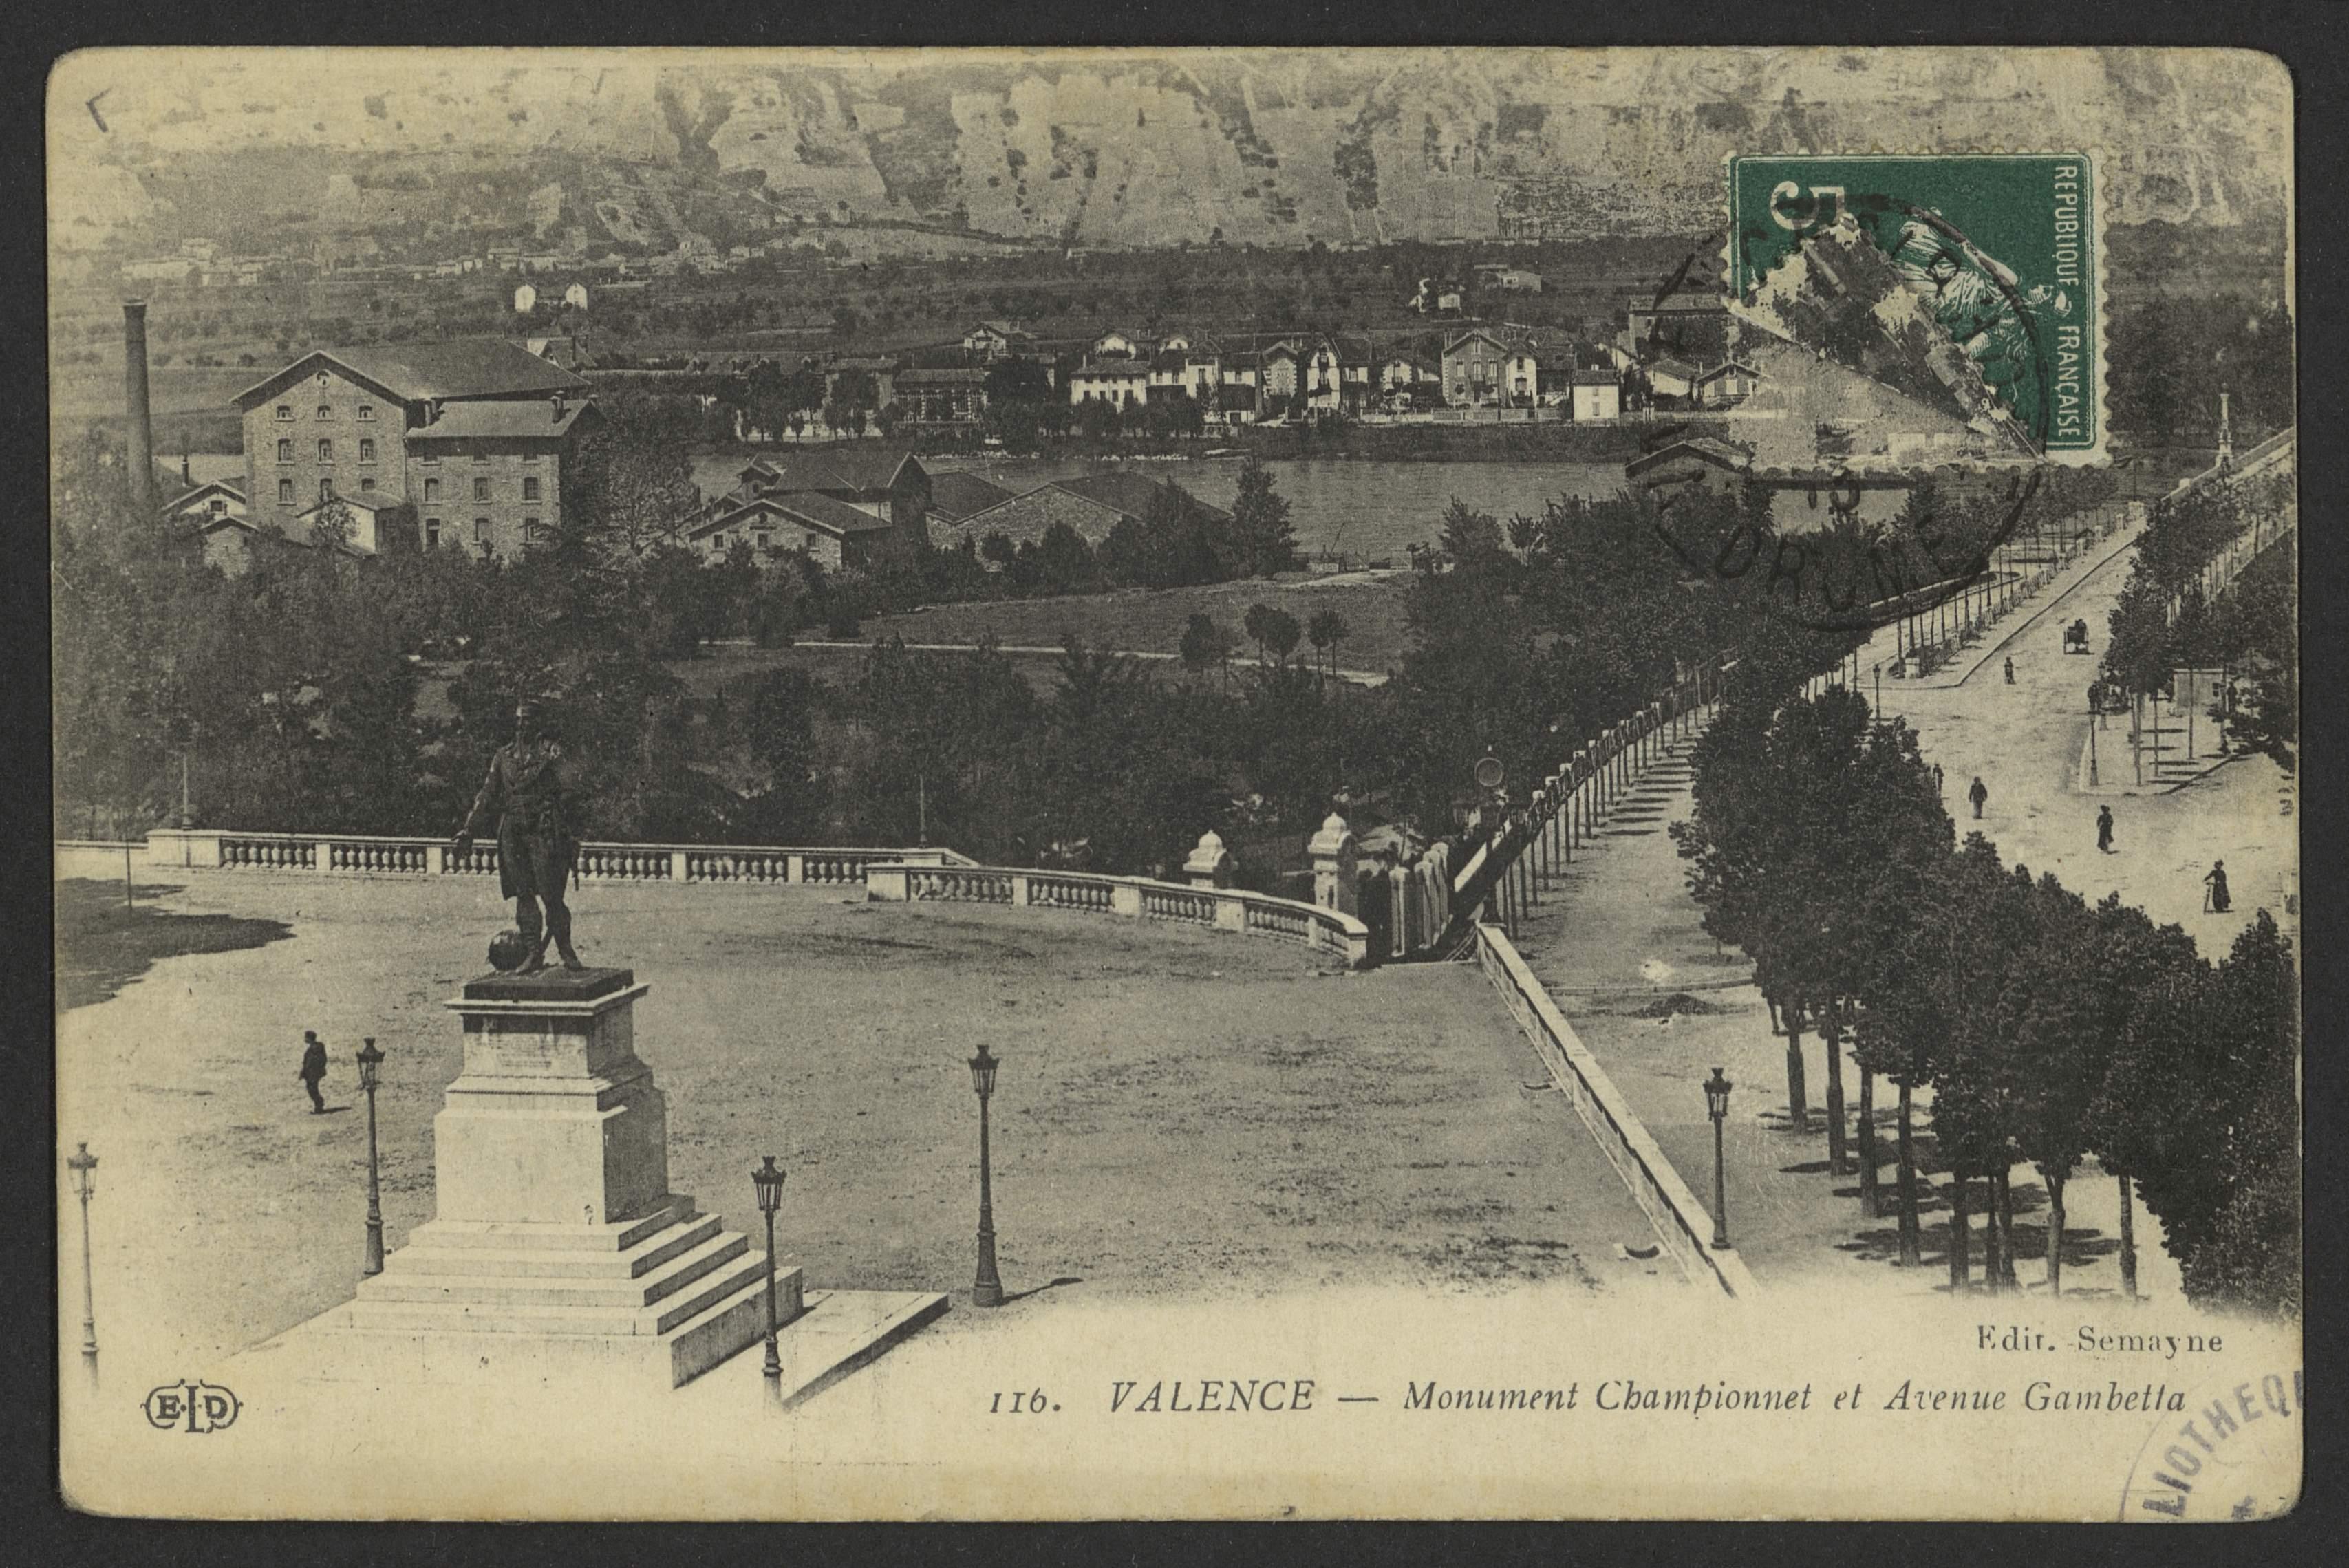 Valence - Monument Championnet et Avenue Gambetta